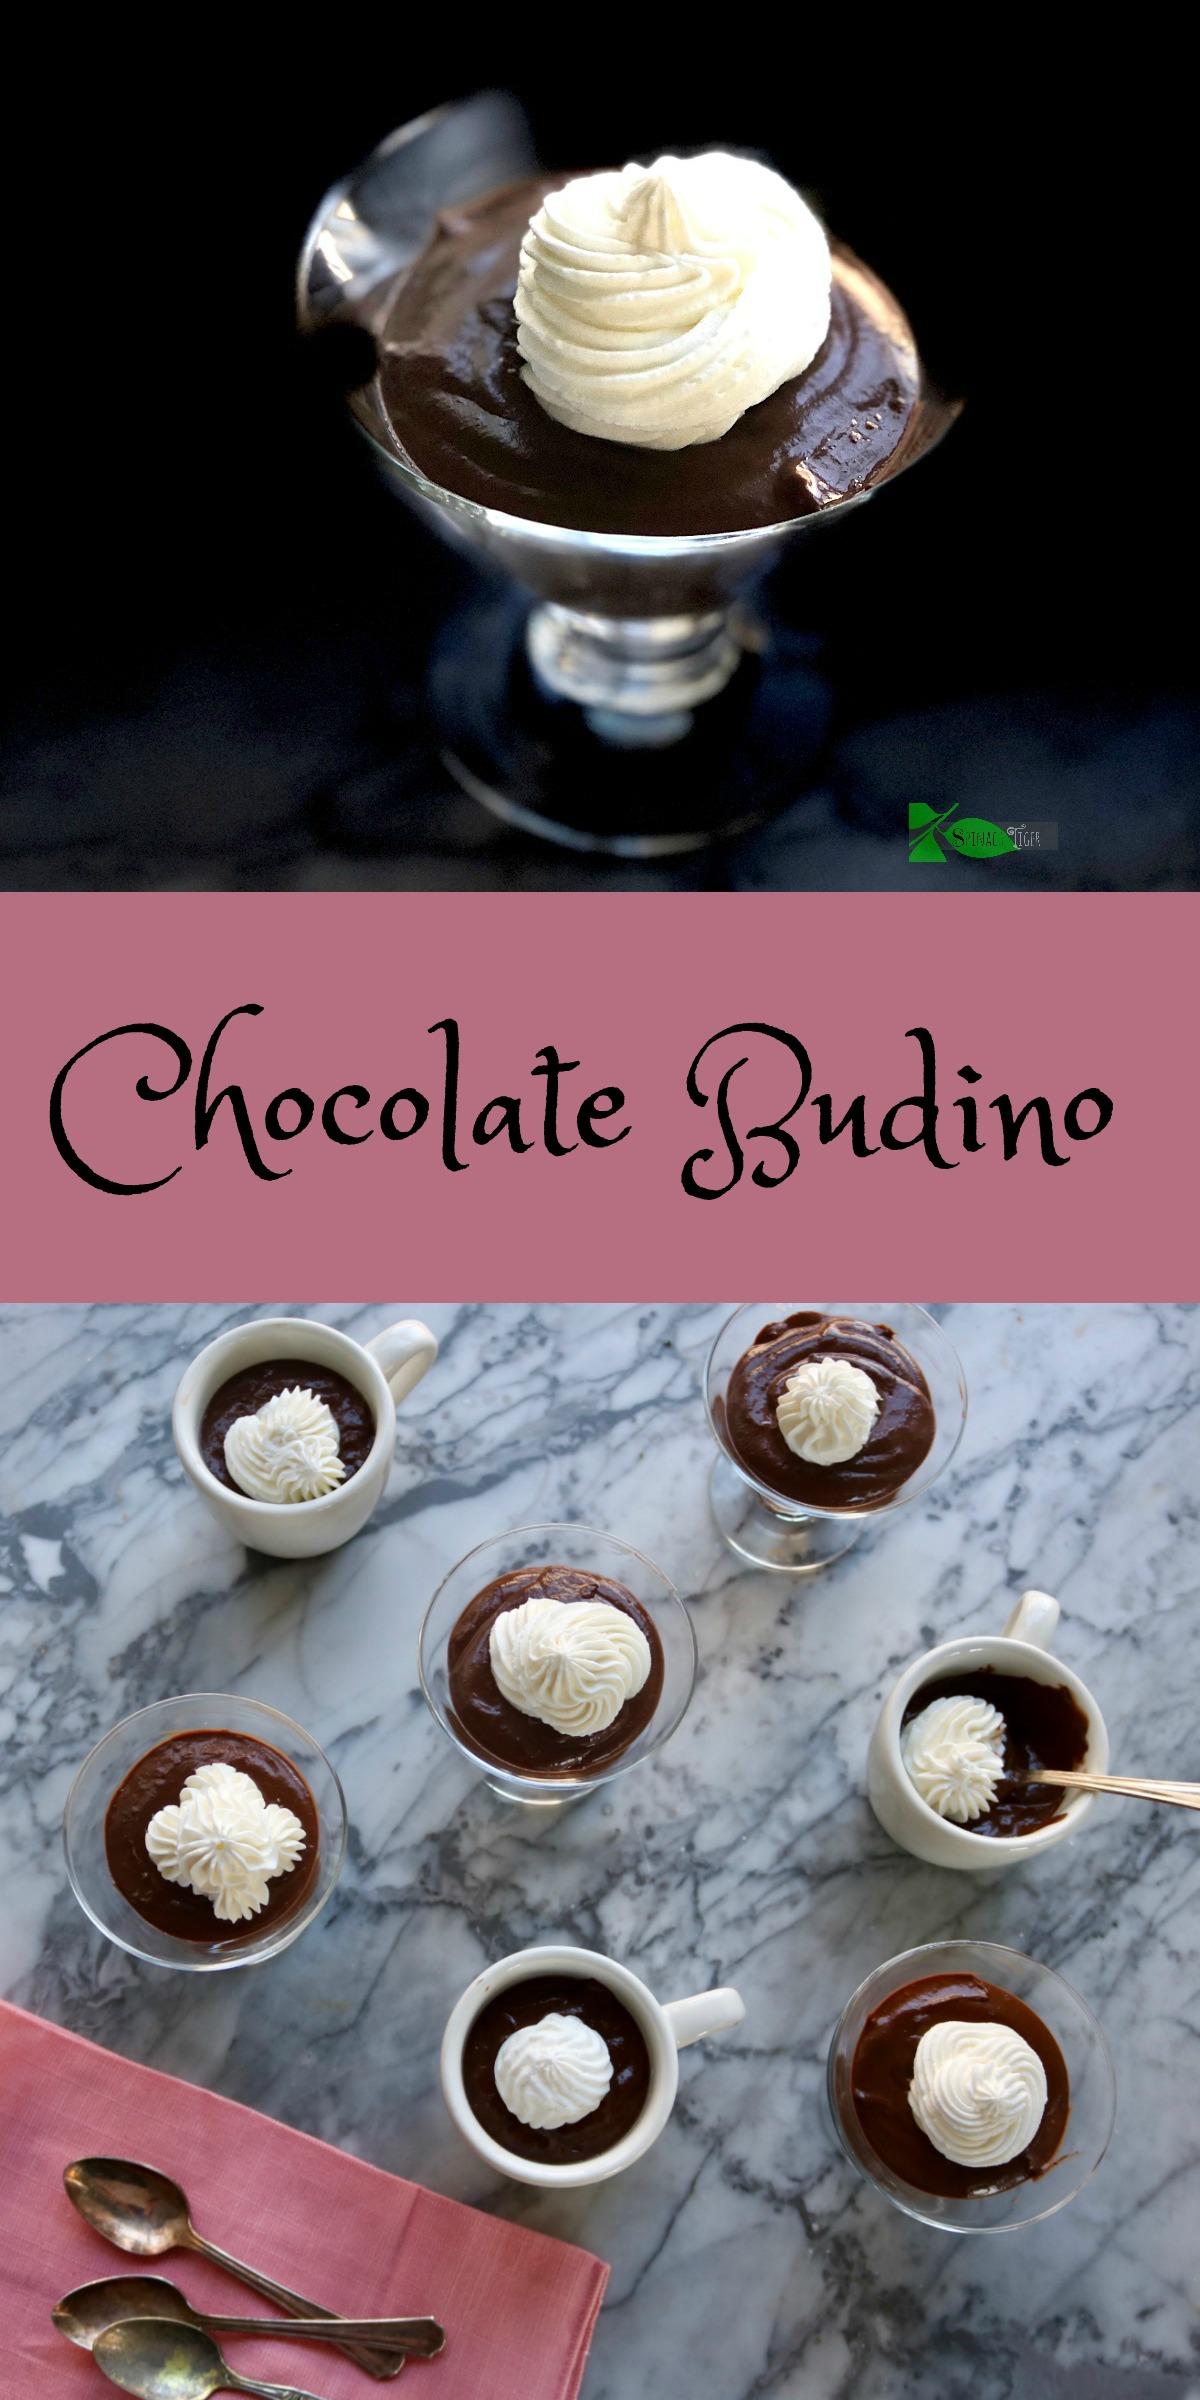 Chocolate Budino with a sugar free option. Thick delicious Italian chocolate pudding. via @angelaroberts